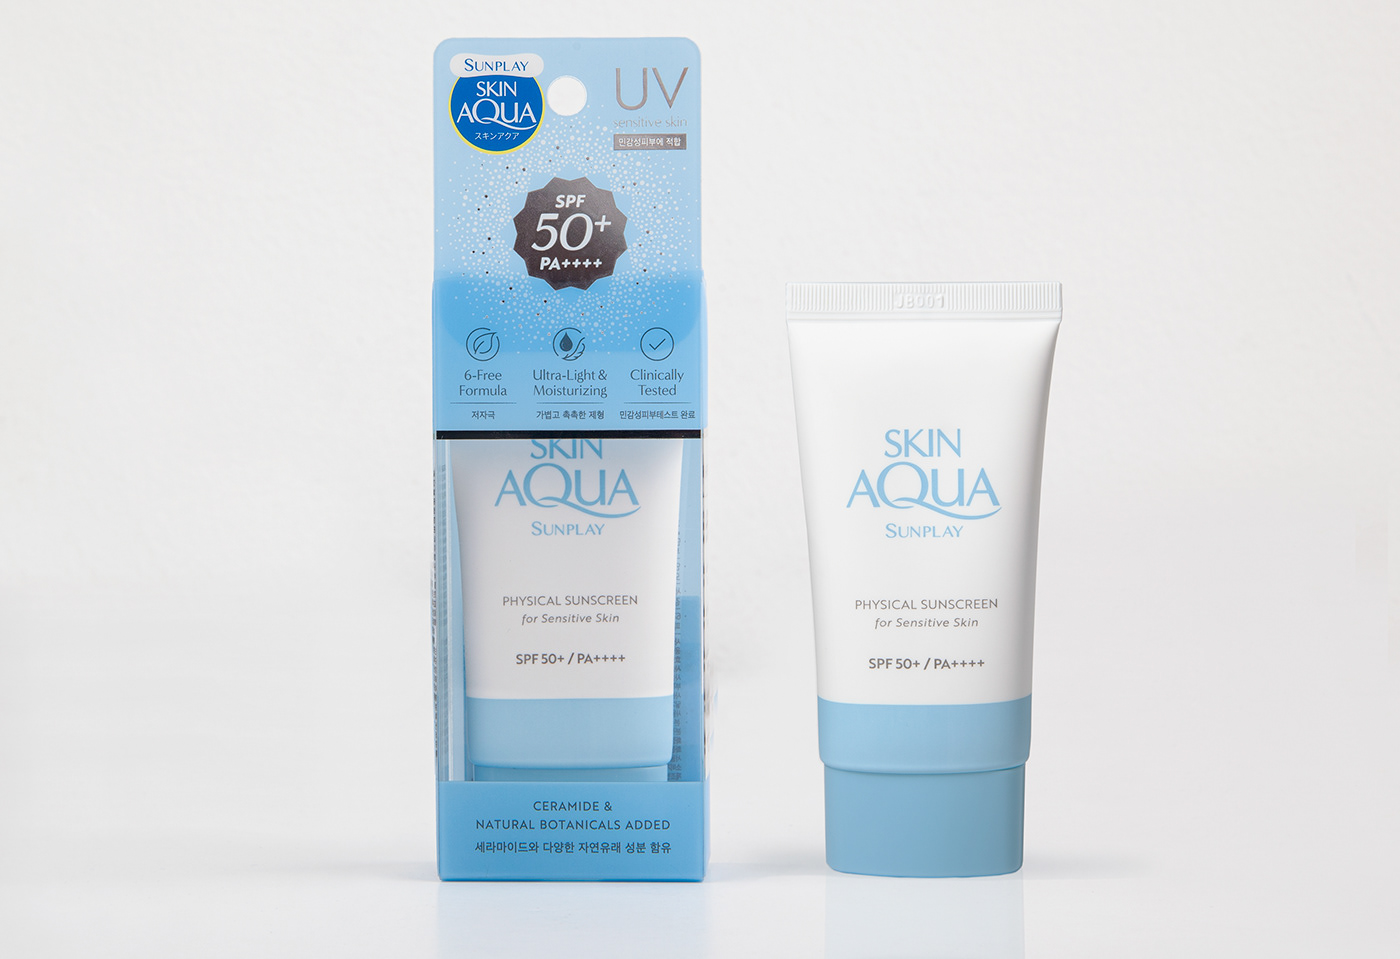 beauty beautypackage branding  Cosmetic graphic graphicdesign packagedesign Packaging